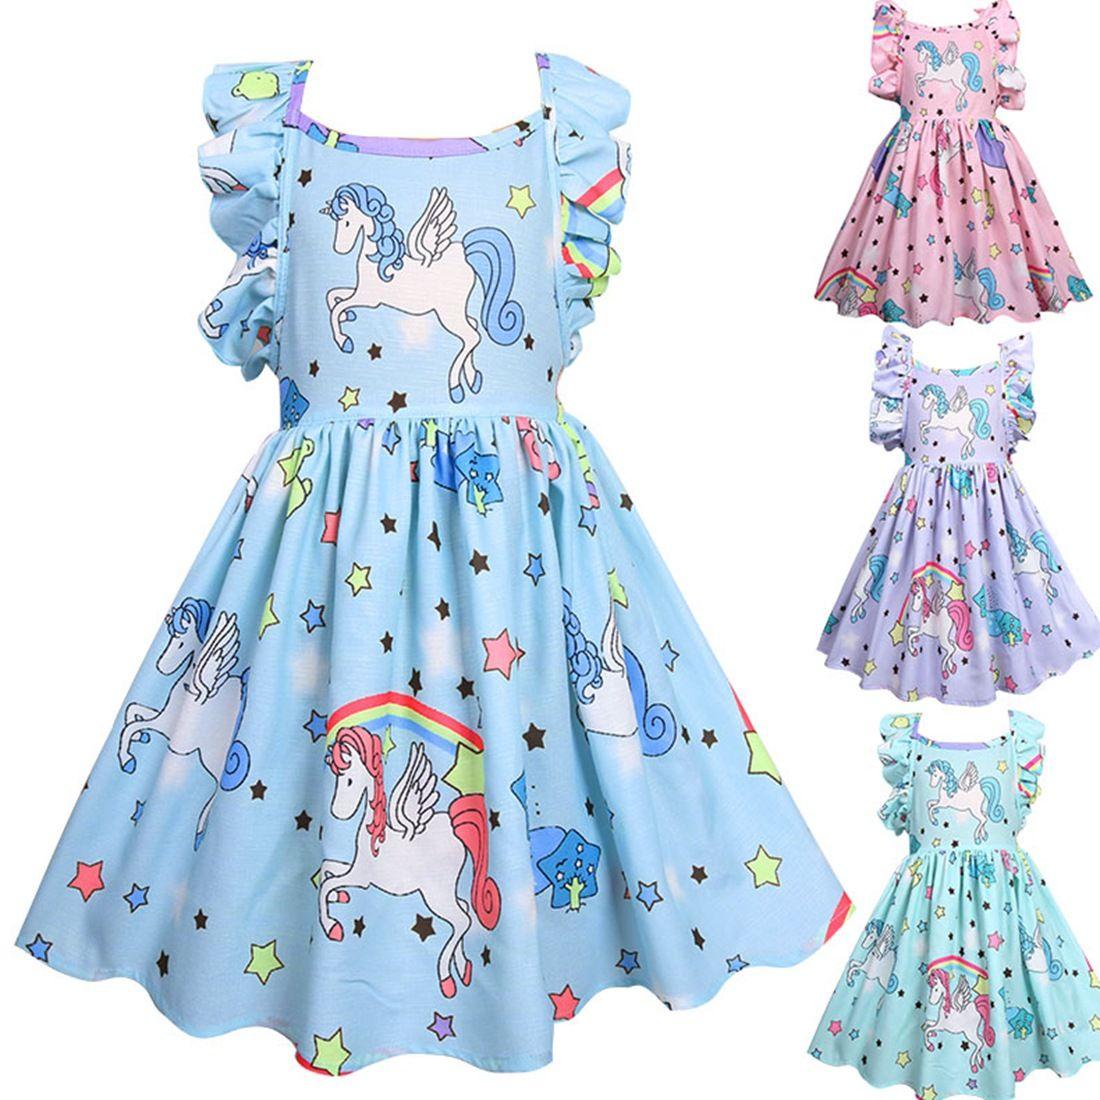 129d93a3 2019 Girls Unicorn Dresses Kids Clothing Kids Girl Princess Flower ...